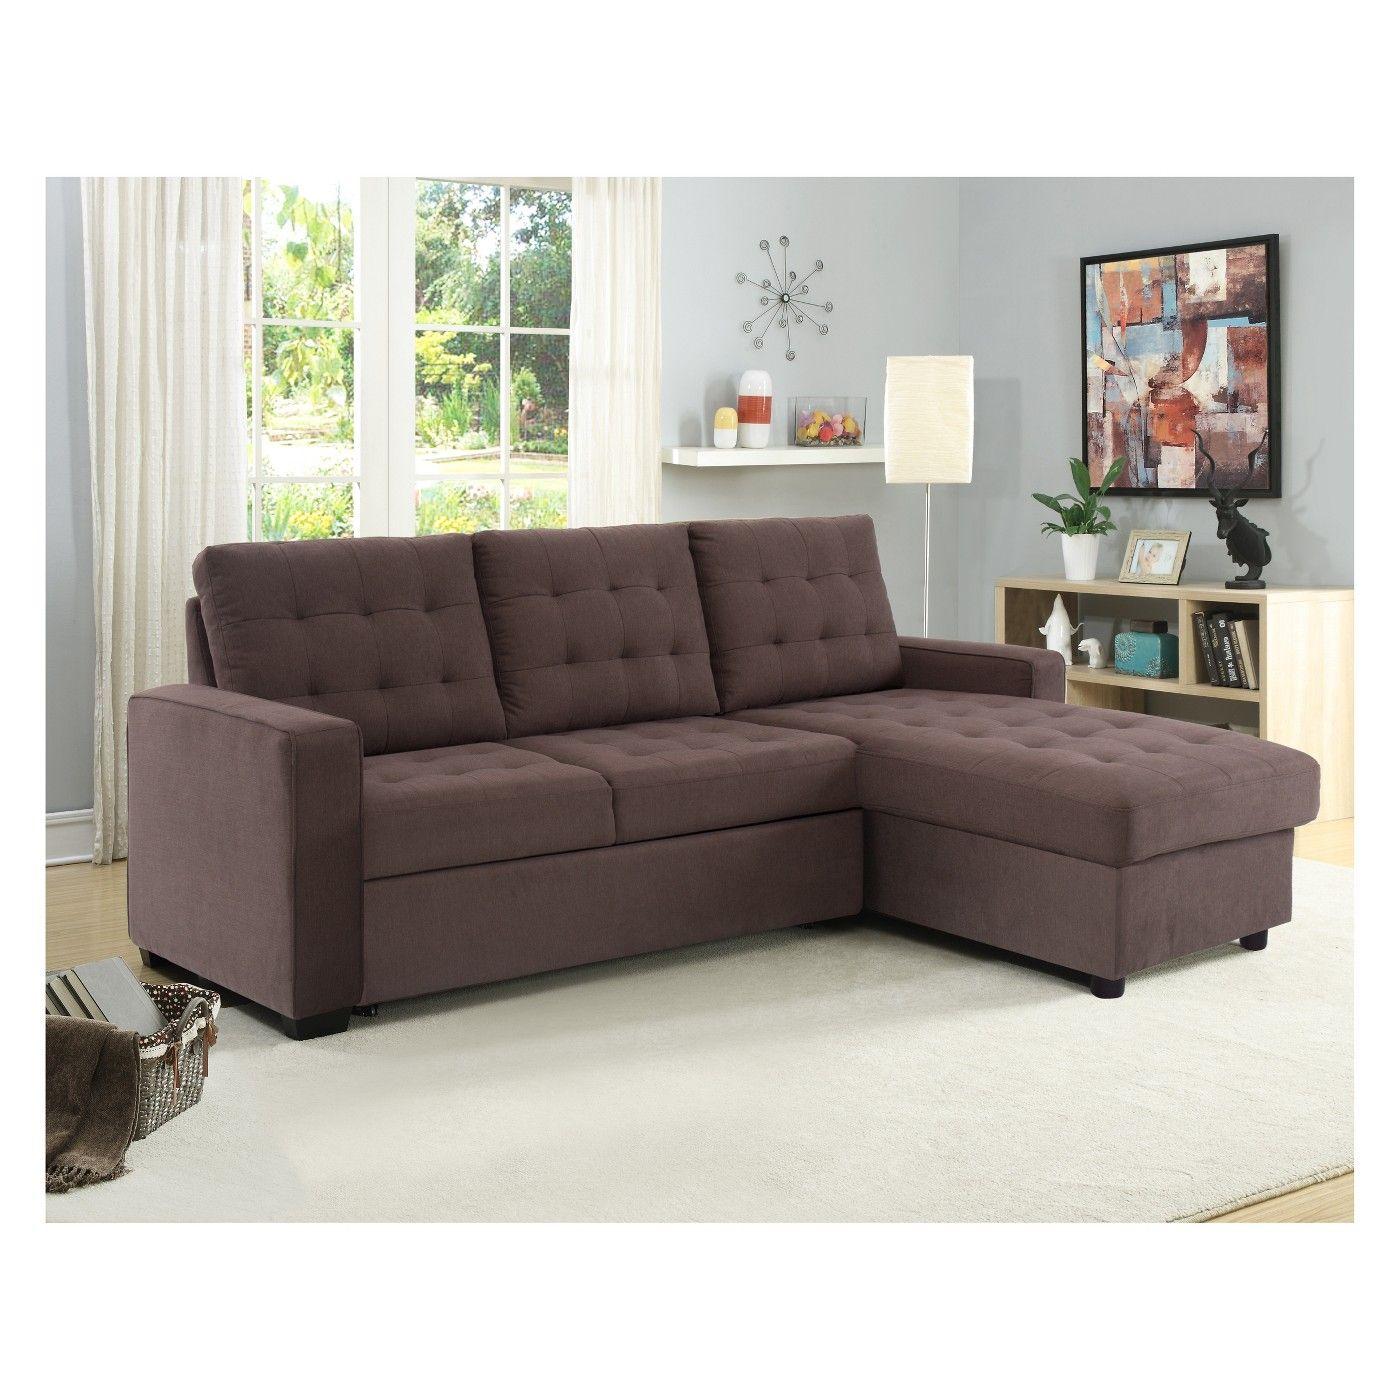 Bernard Tufted Microfiber Convertible Sofa with Storage in Espresso ...